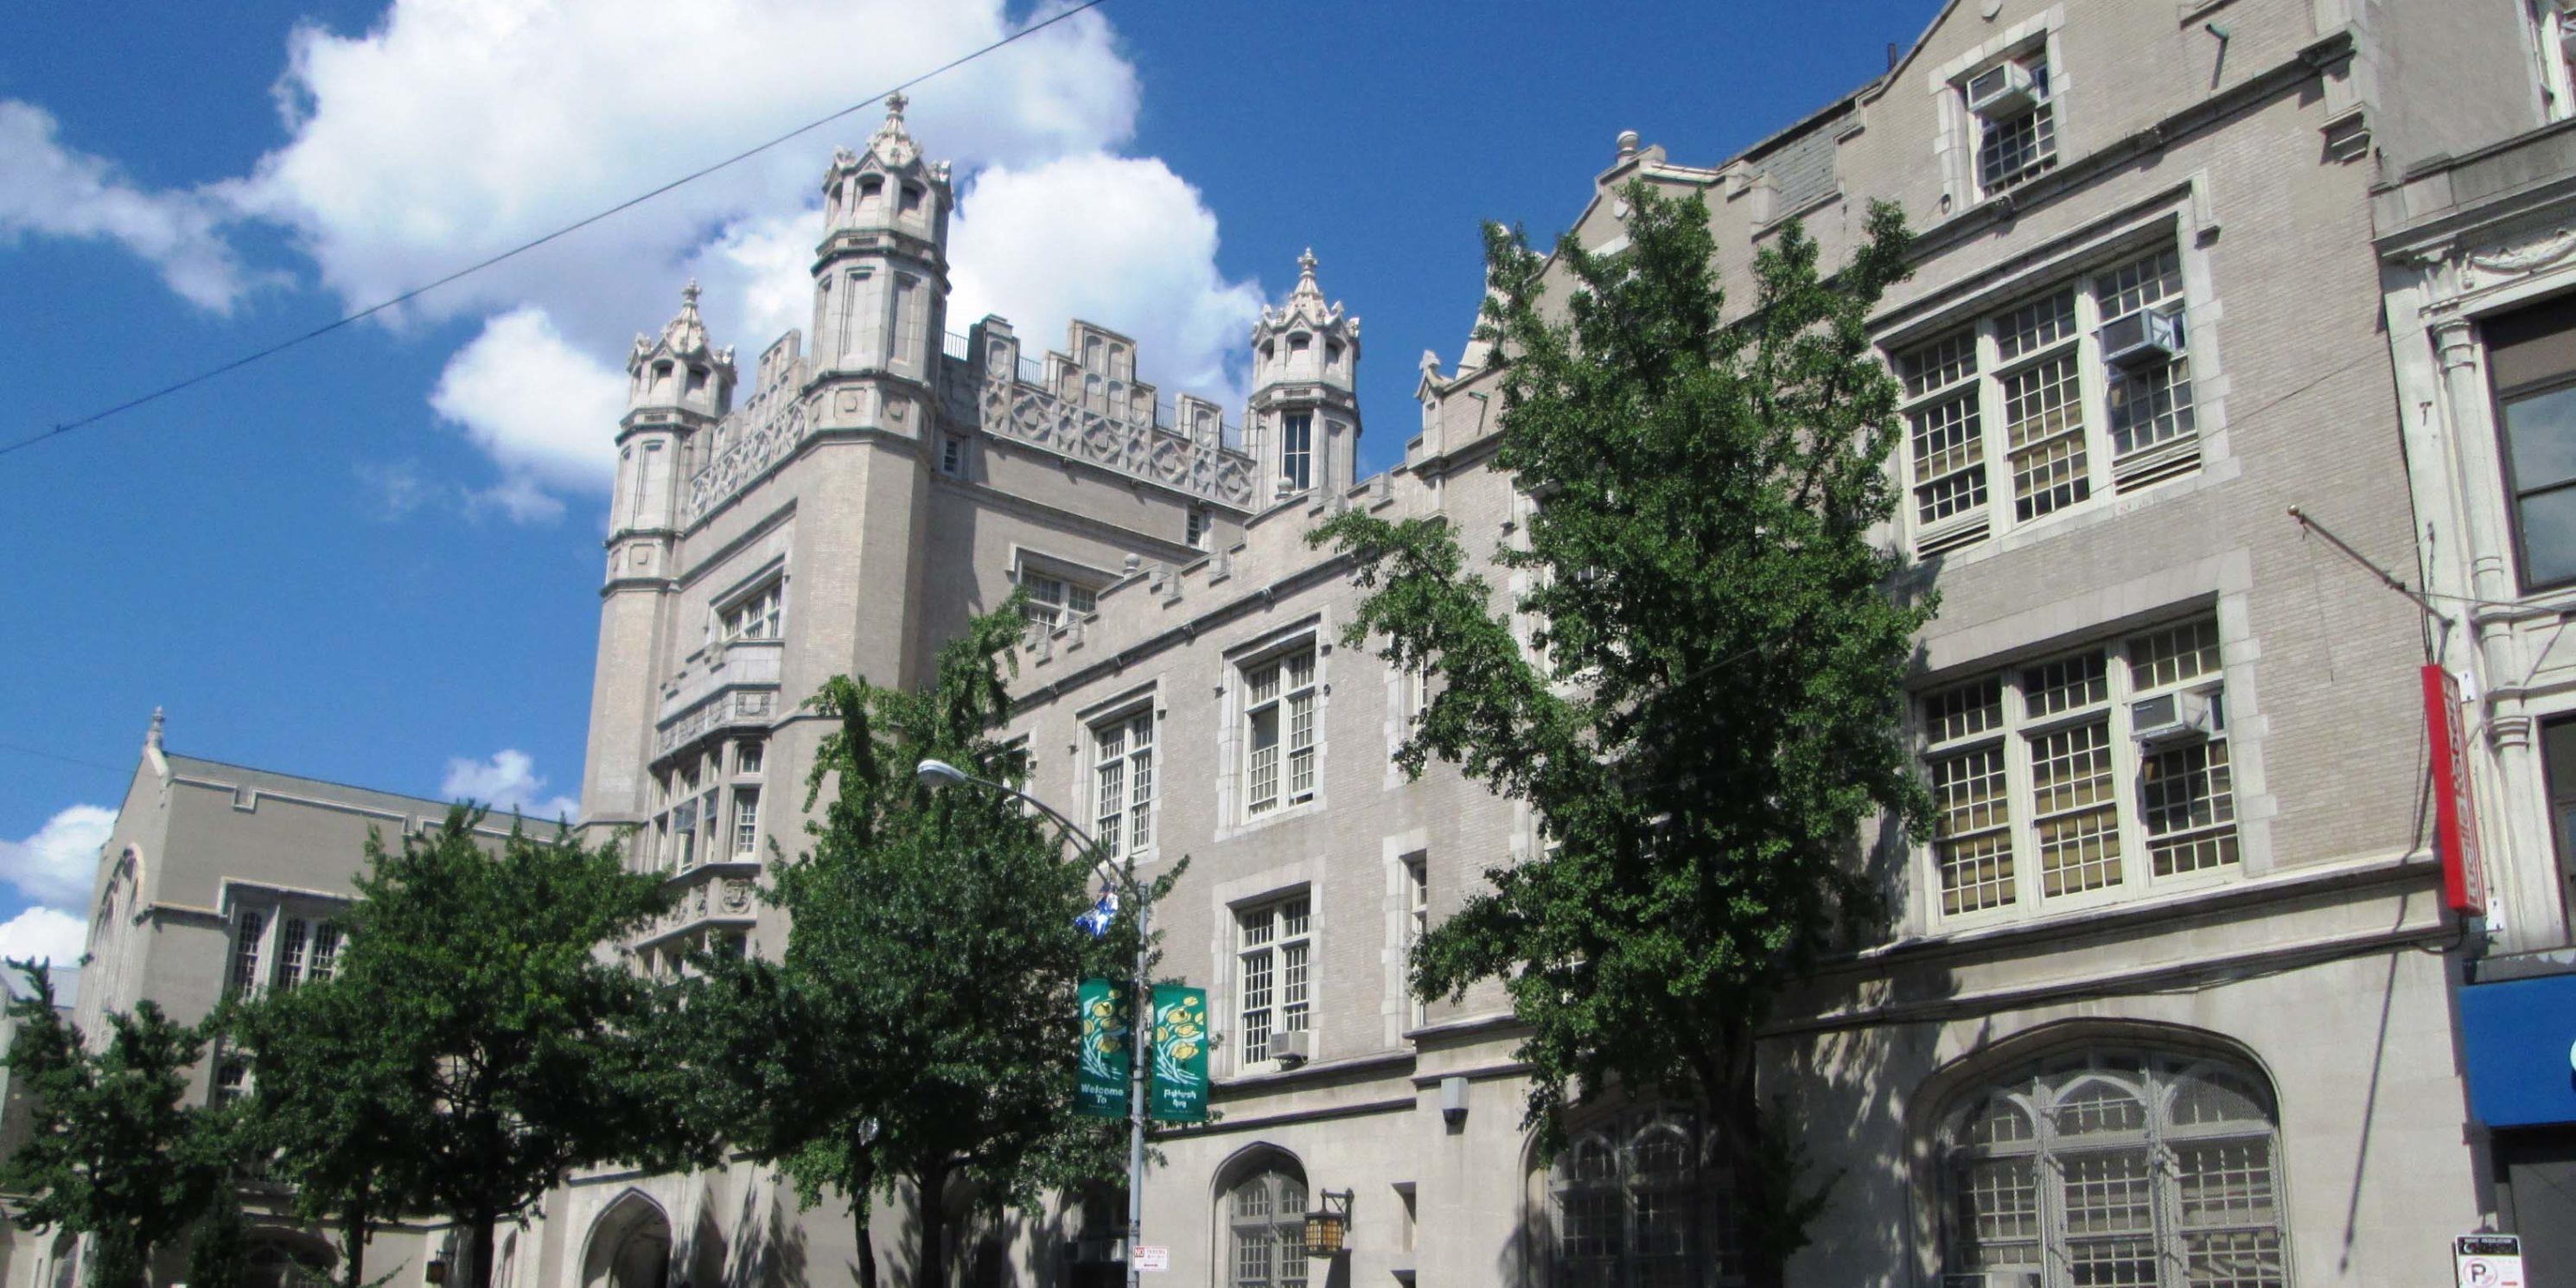 exterior of Erasmus Hall High School in Brooklyn